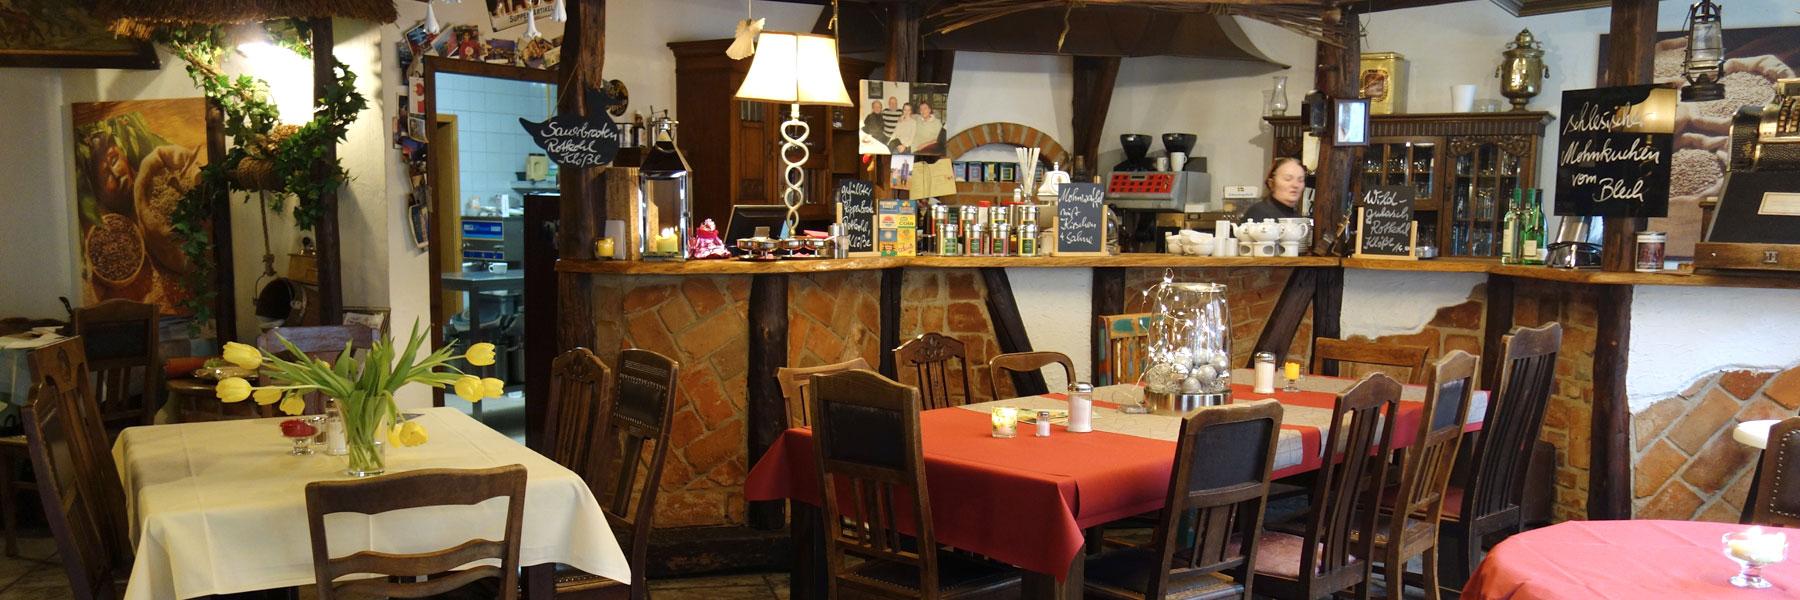 Tresen - Pension & Café Altstadt